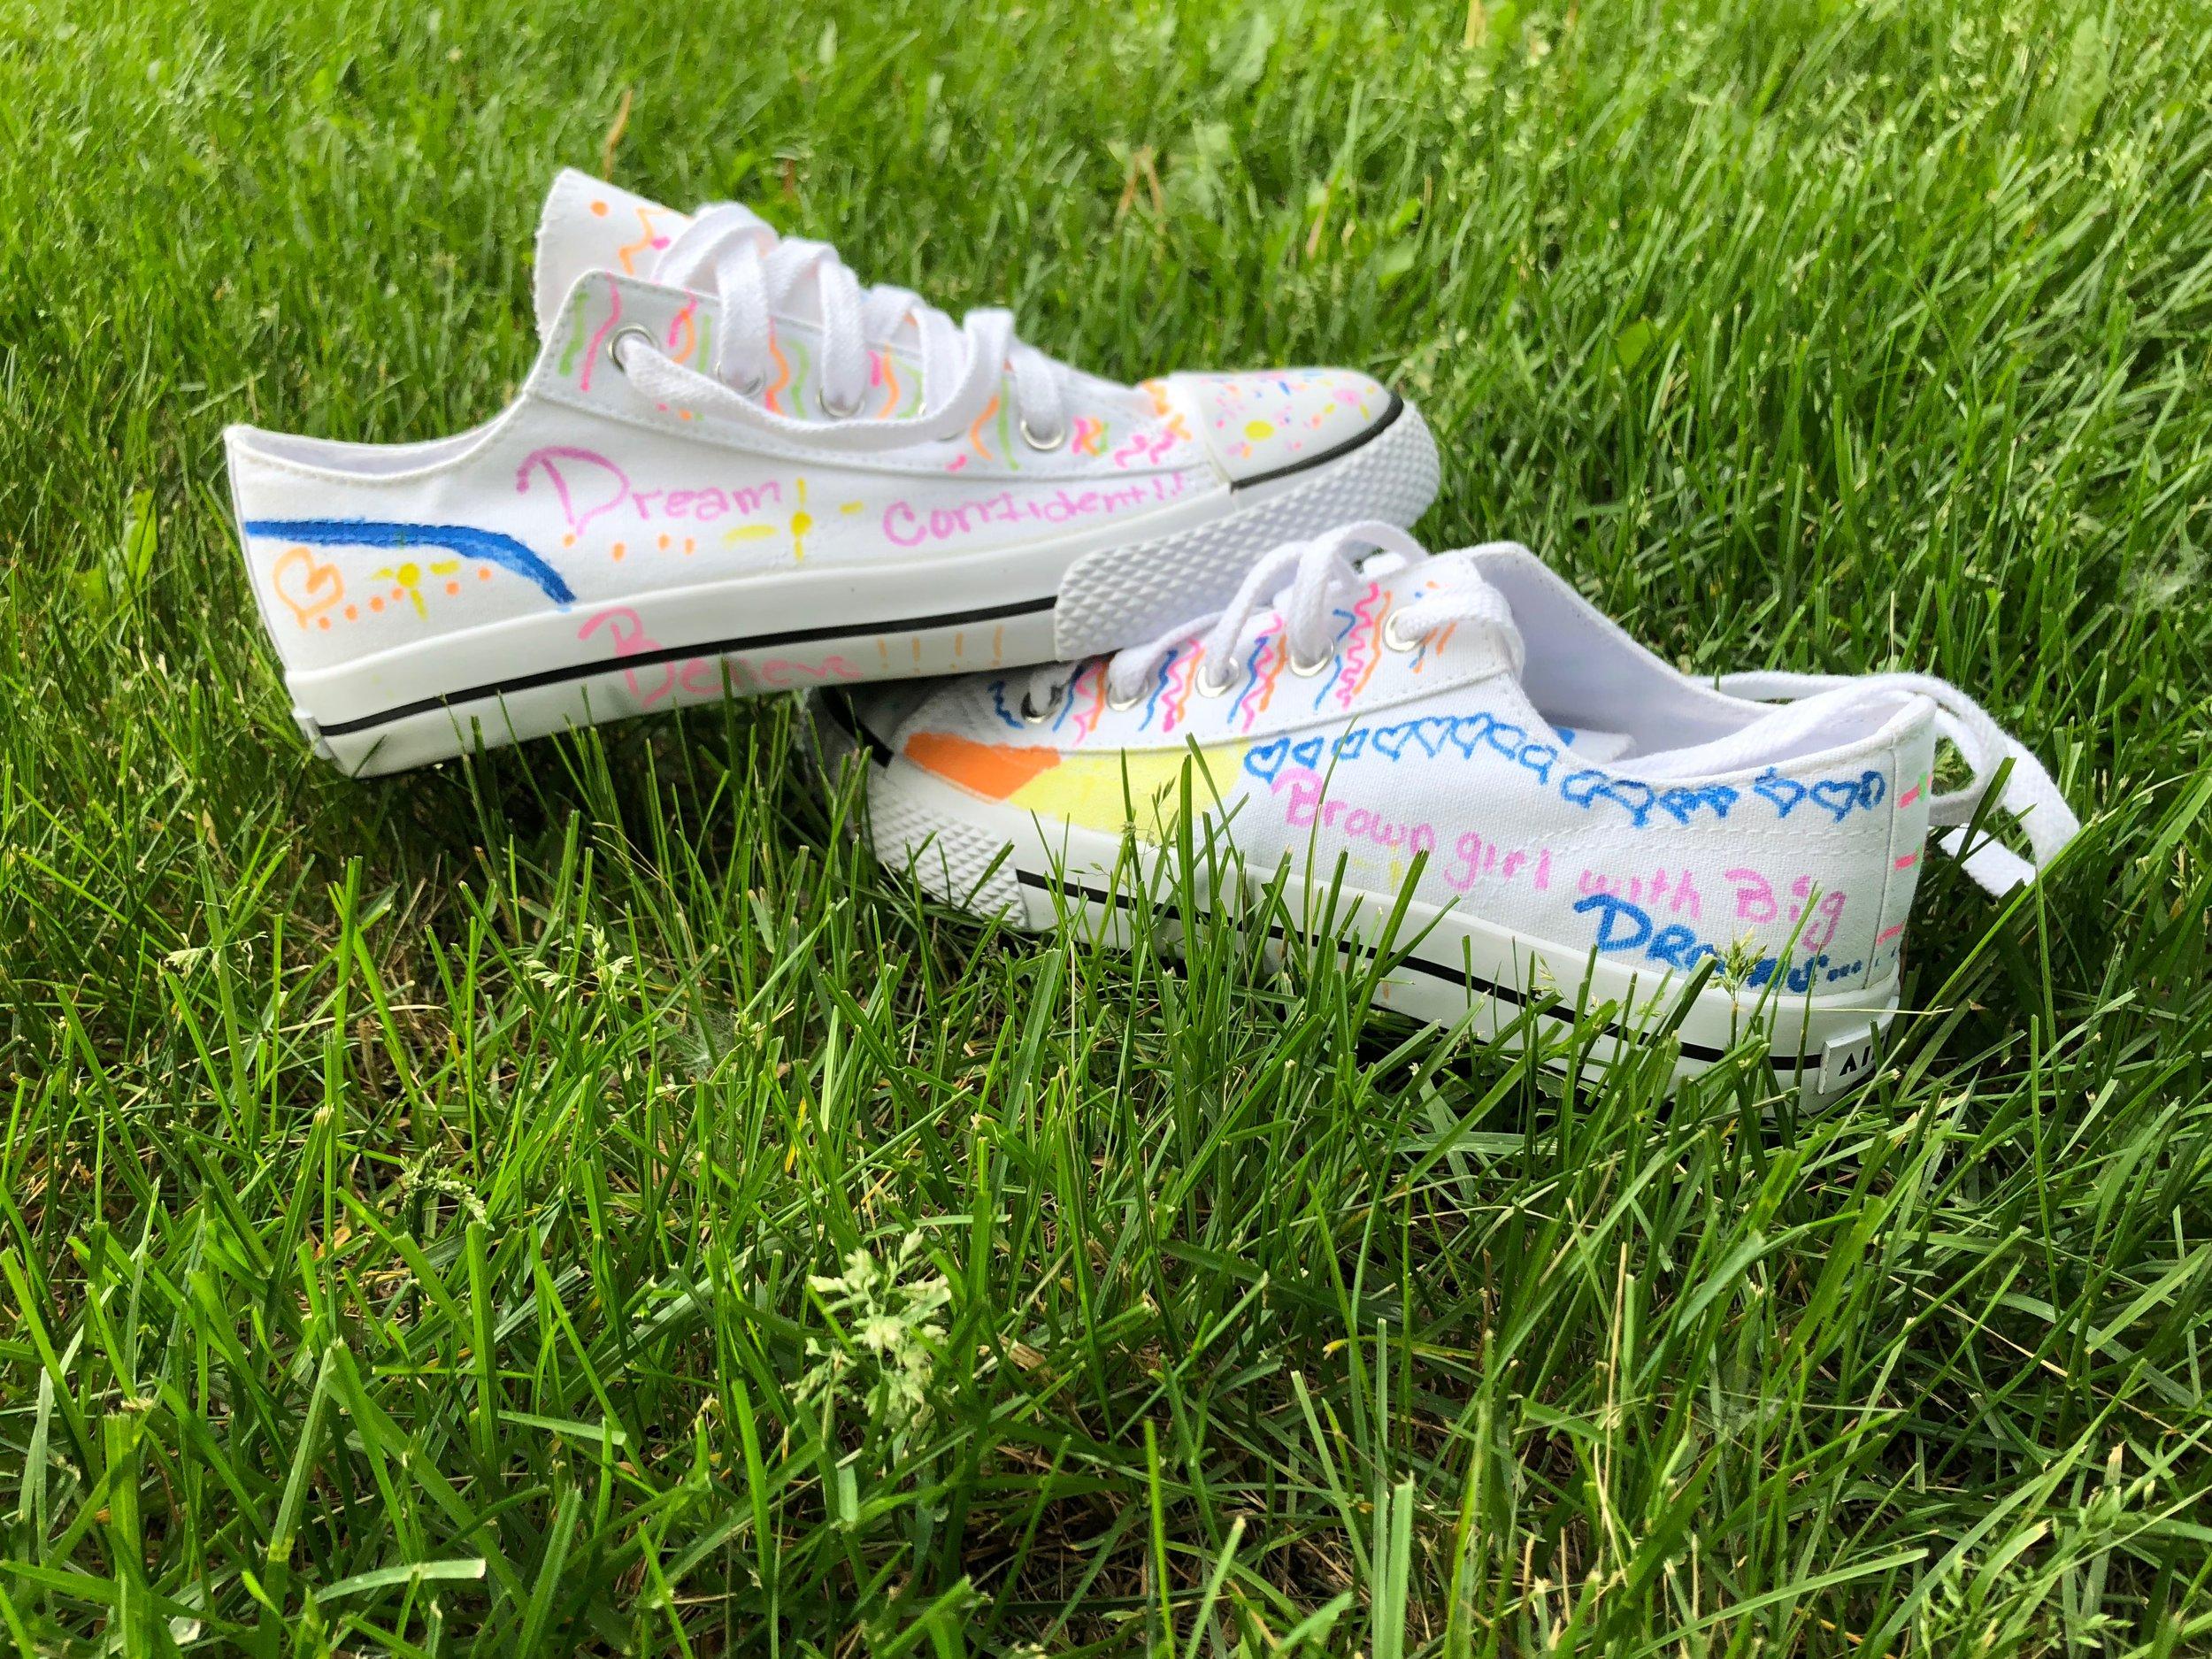 San'dexcia's shoe design.